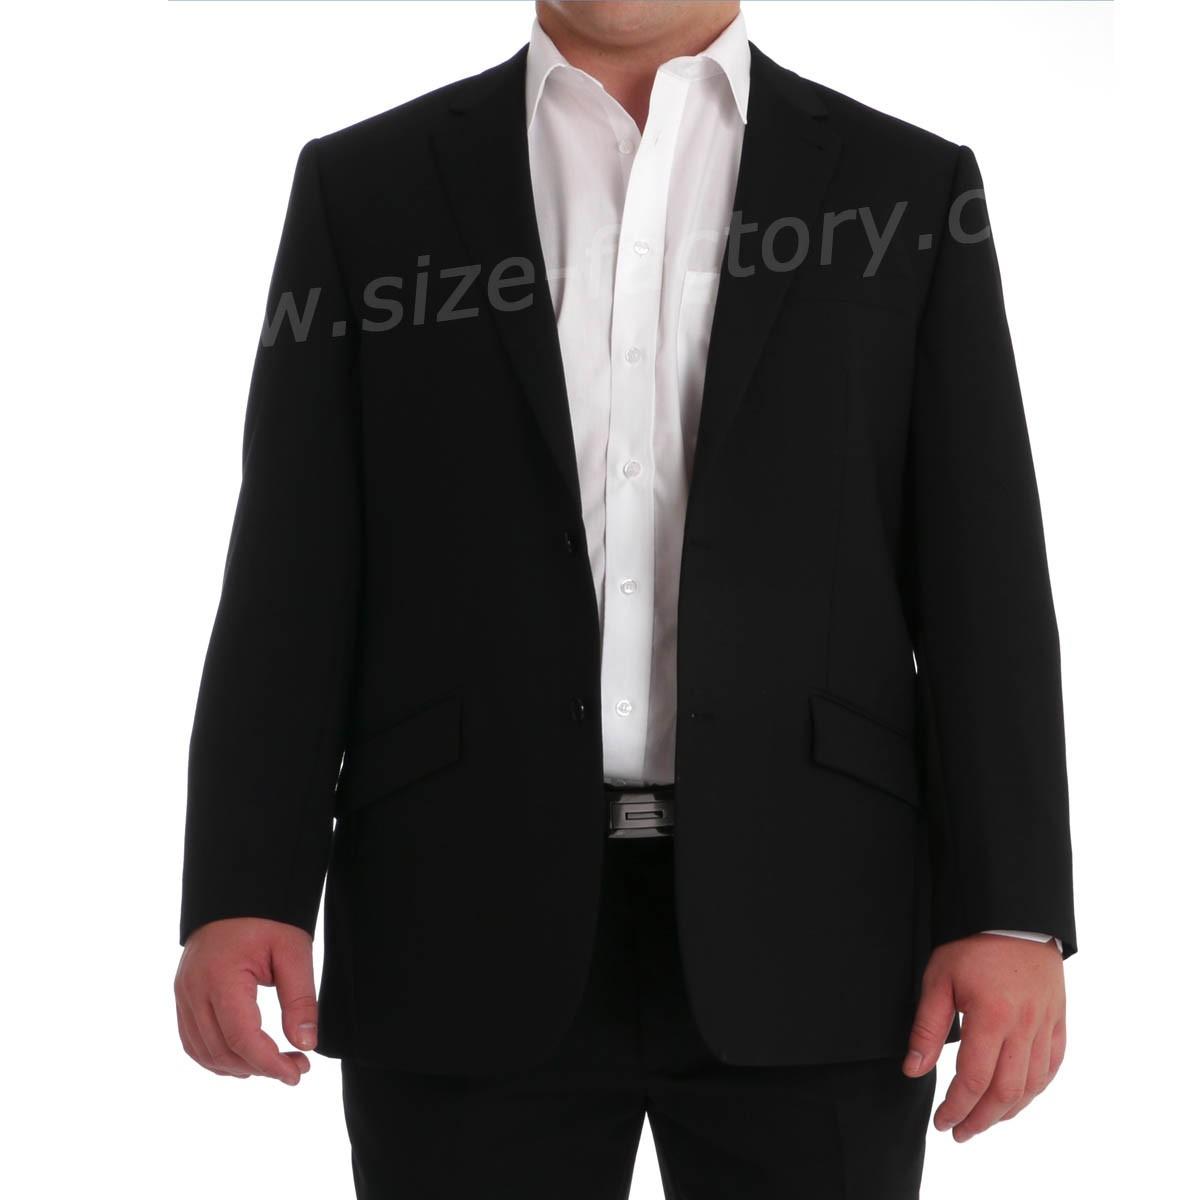 accueil homme costume veste de costume stretch car. Black Bedroom Furniture Sets. Home Design Ideas